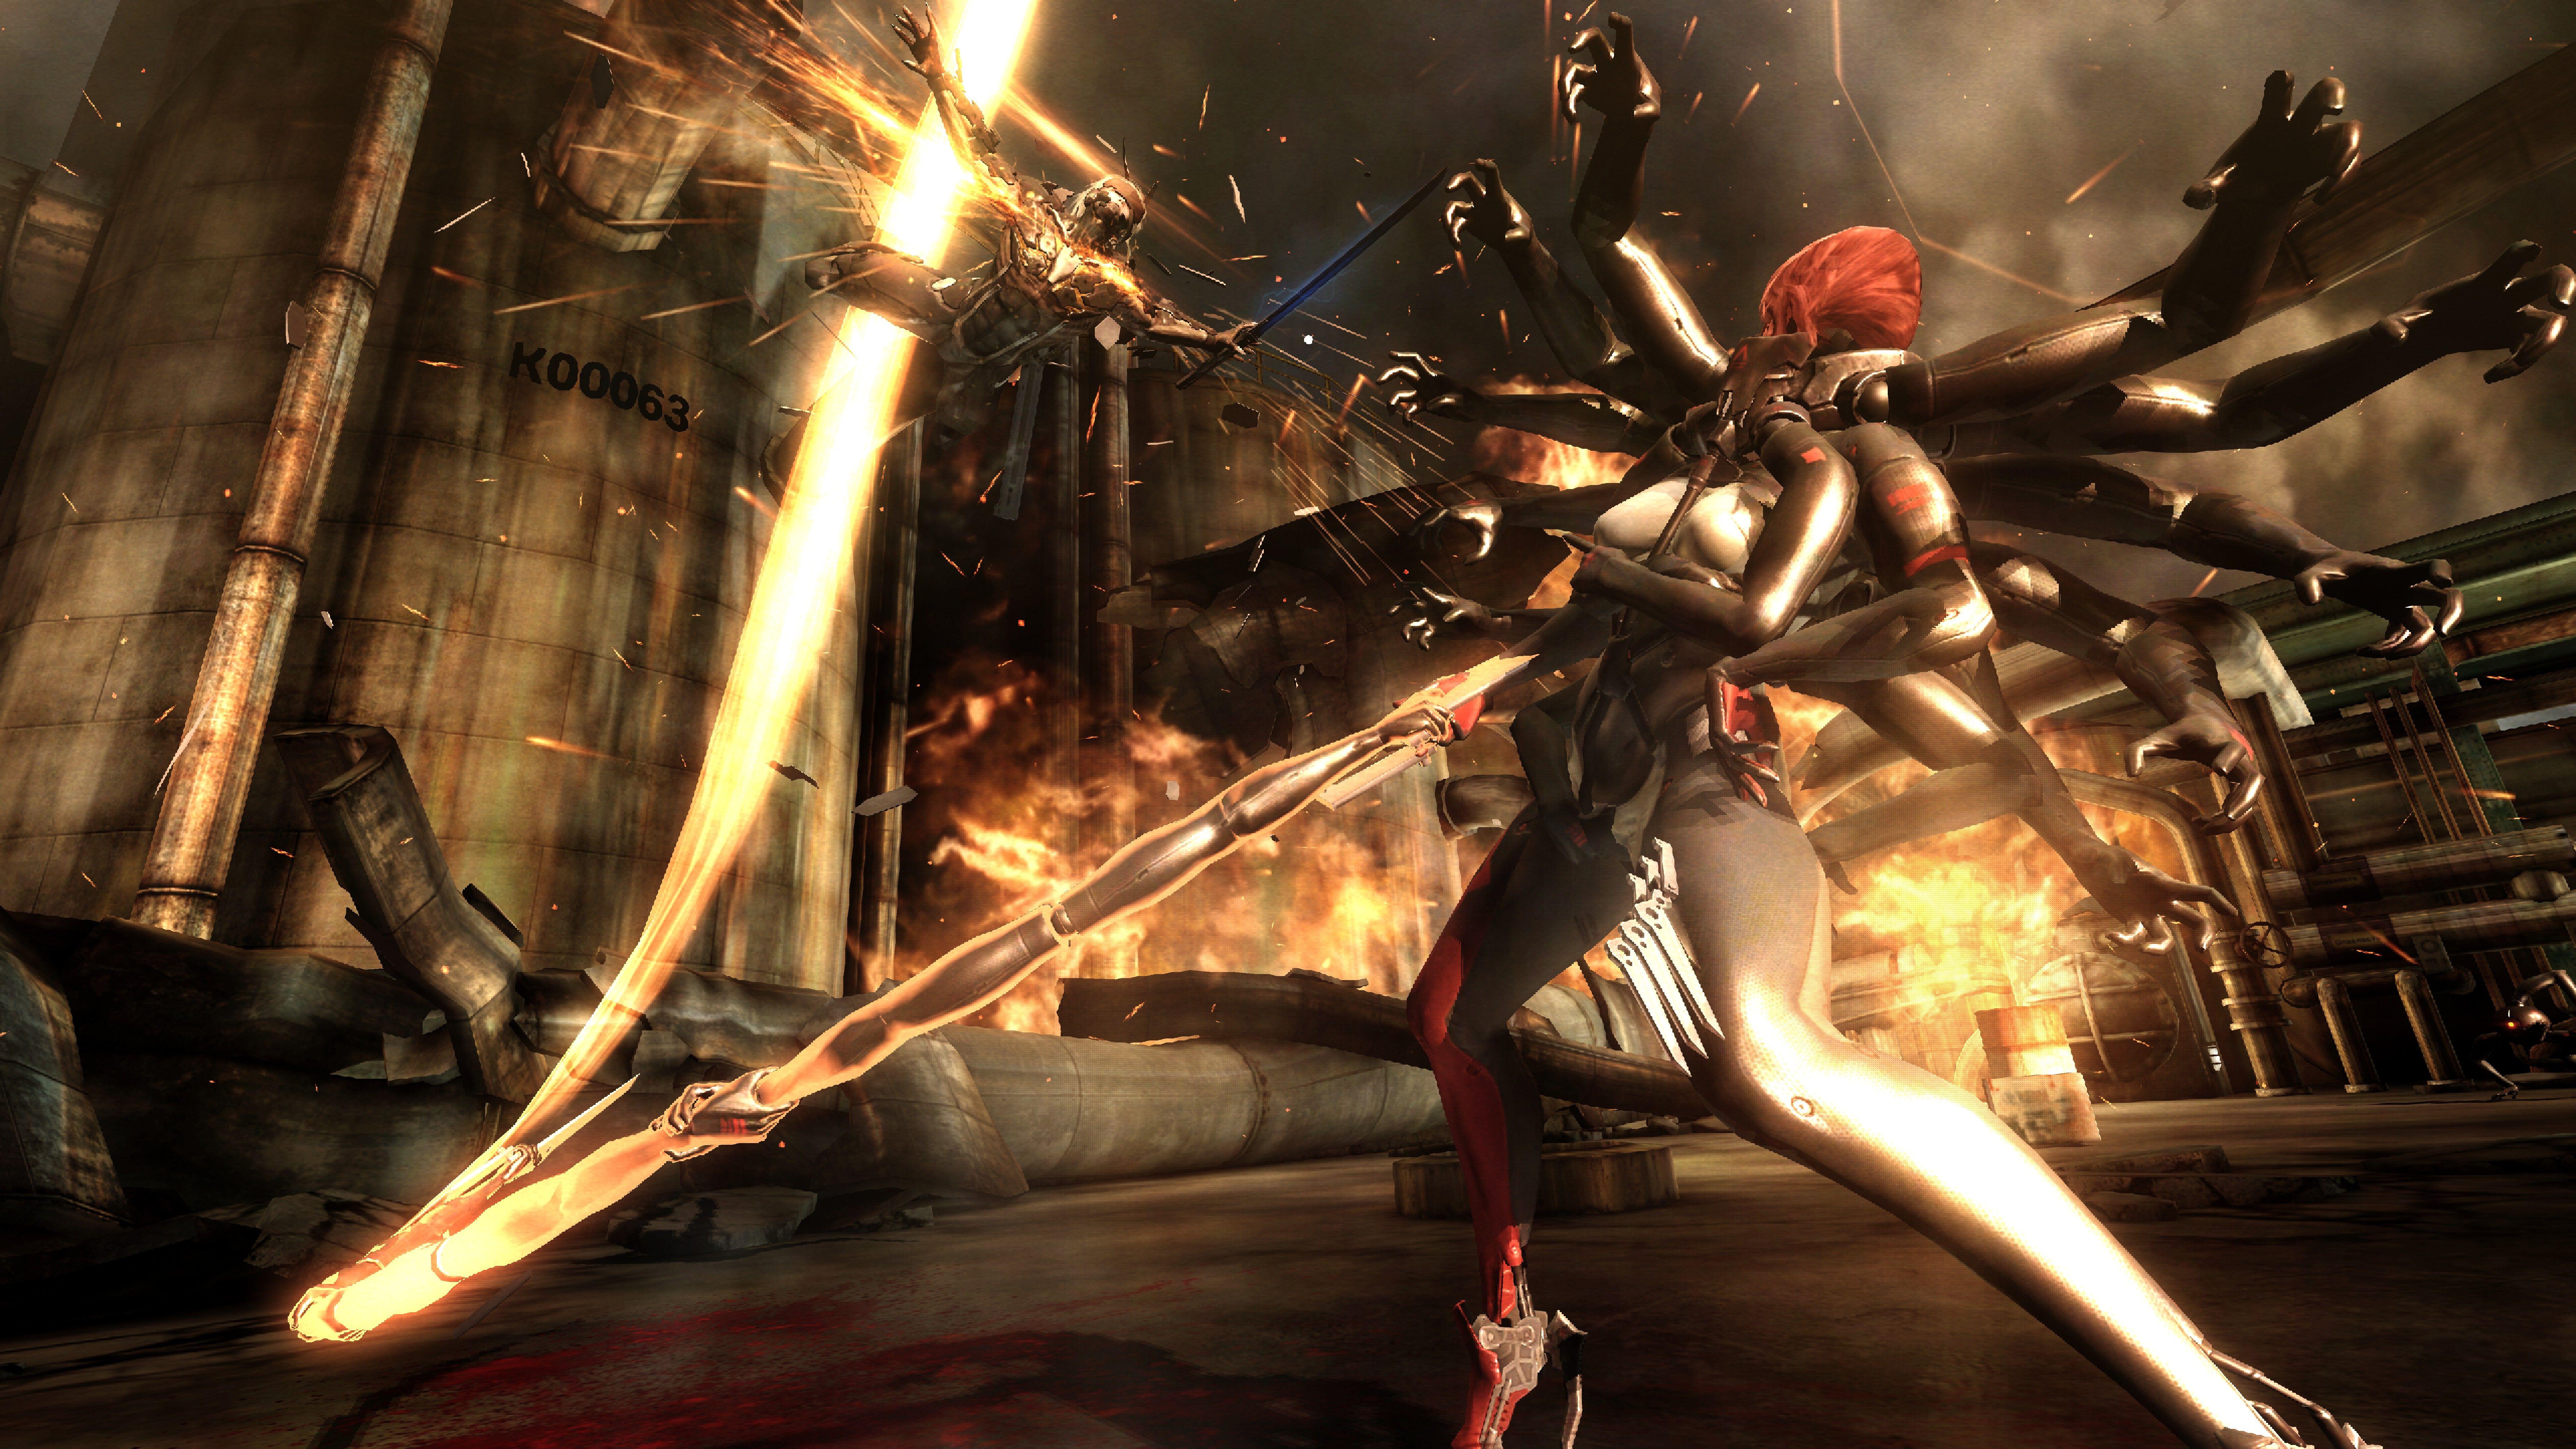 Metal Gear Rising: Revengeance - Metal Gear Rising: Revengeance 8K